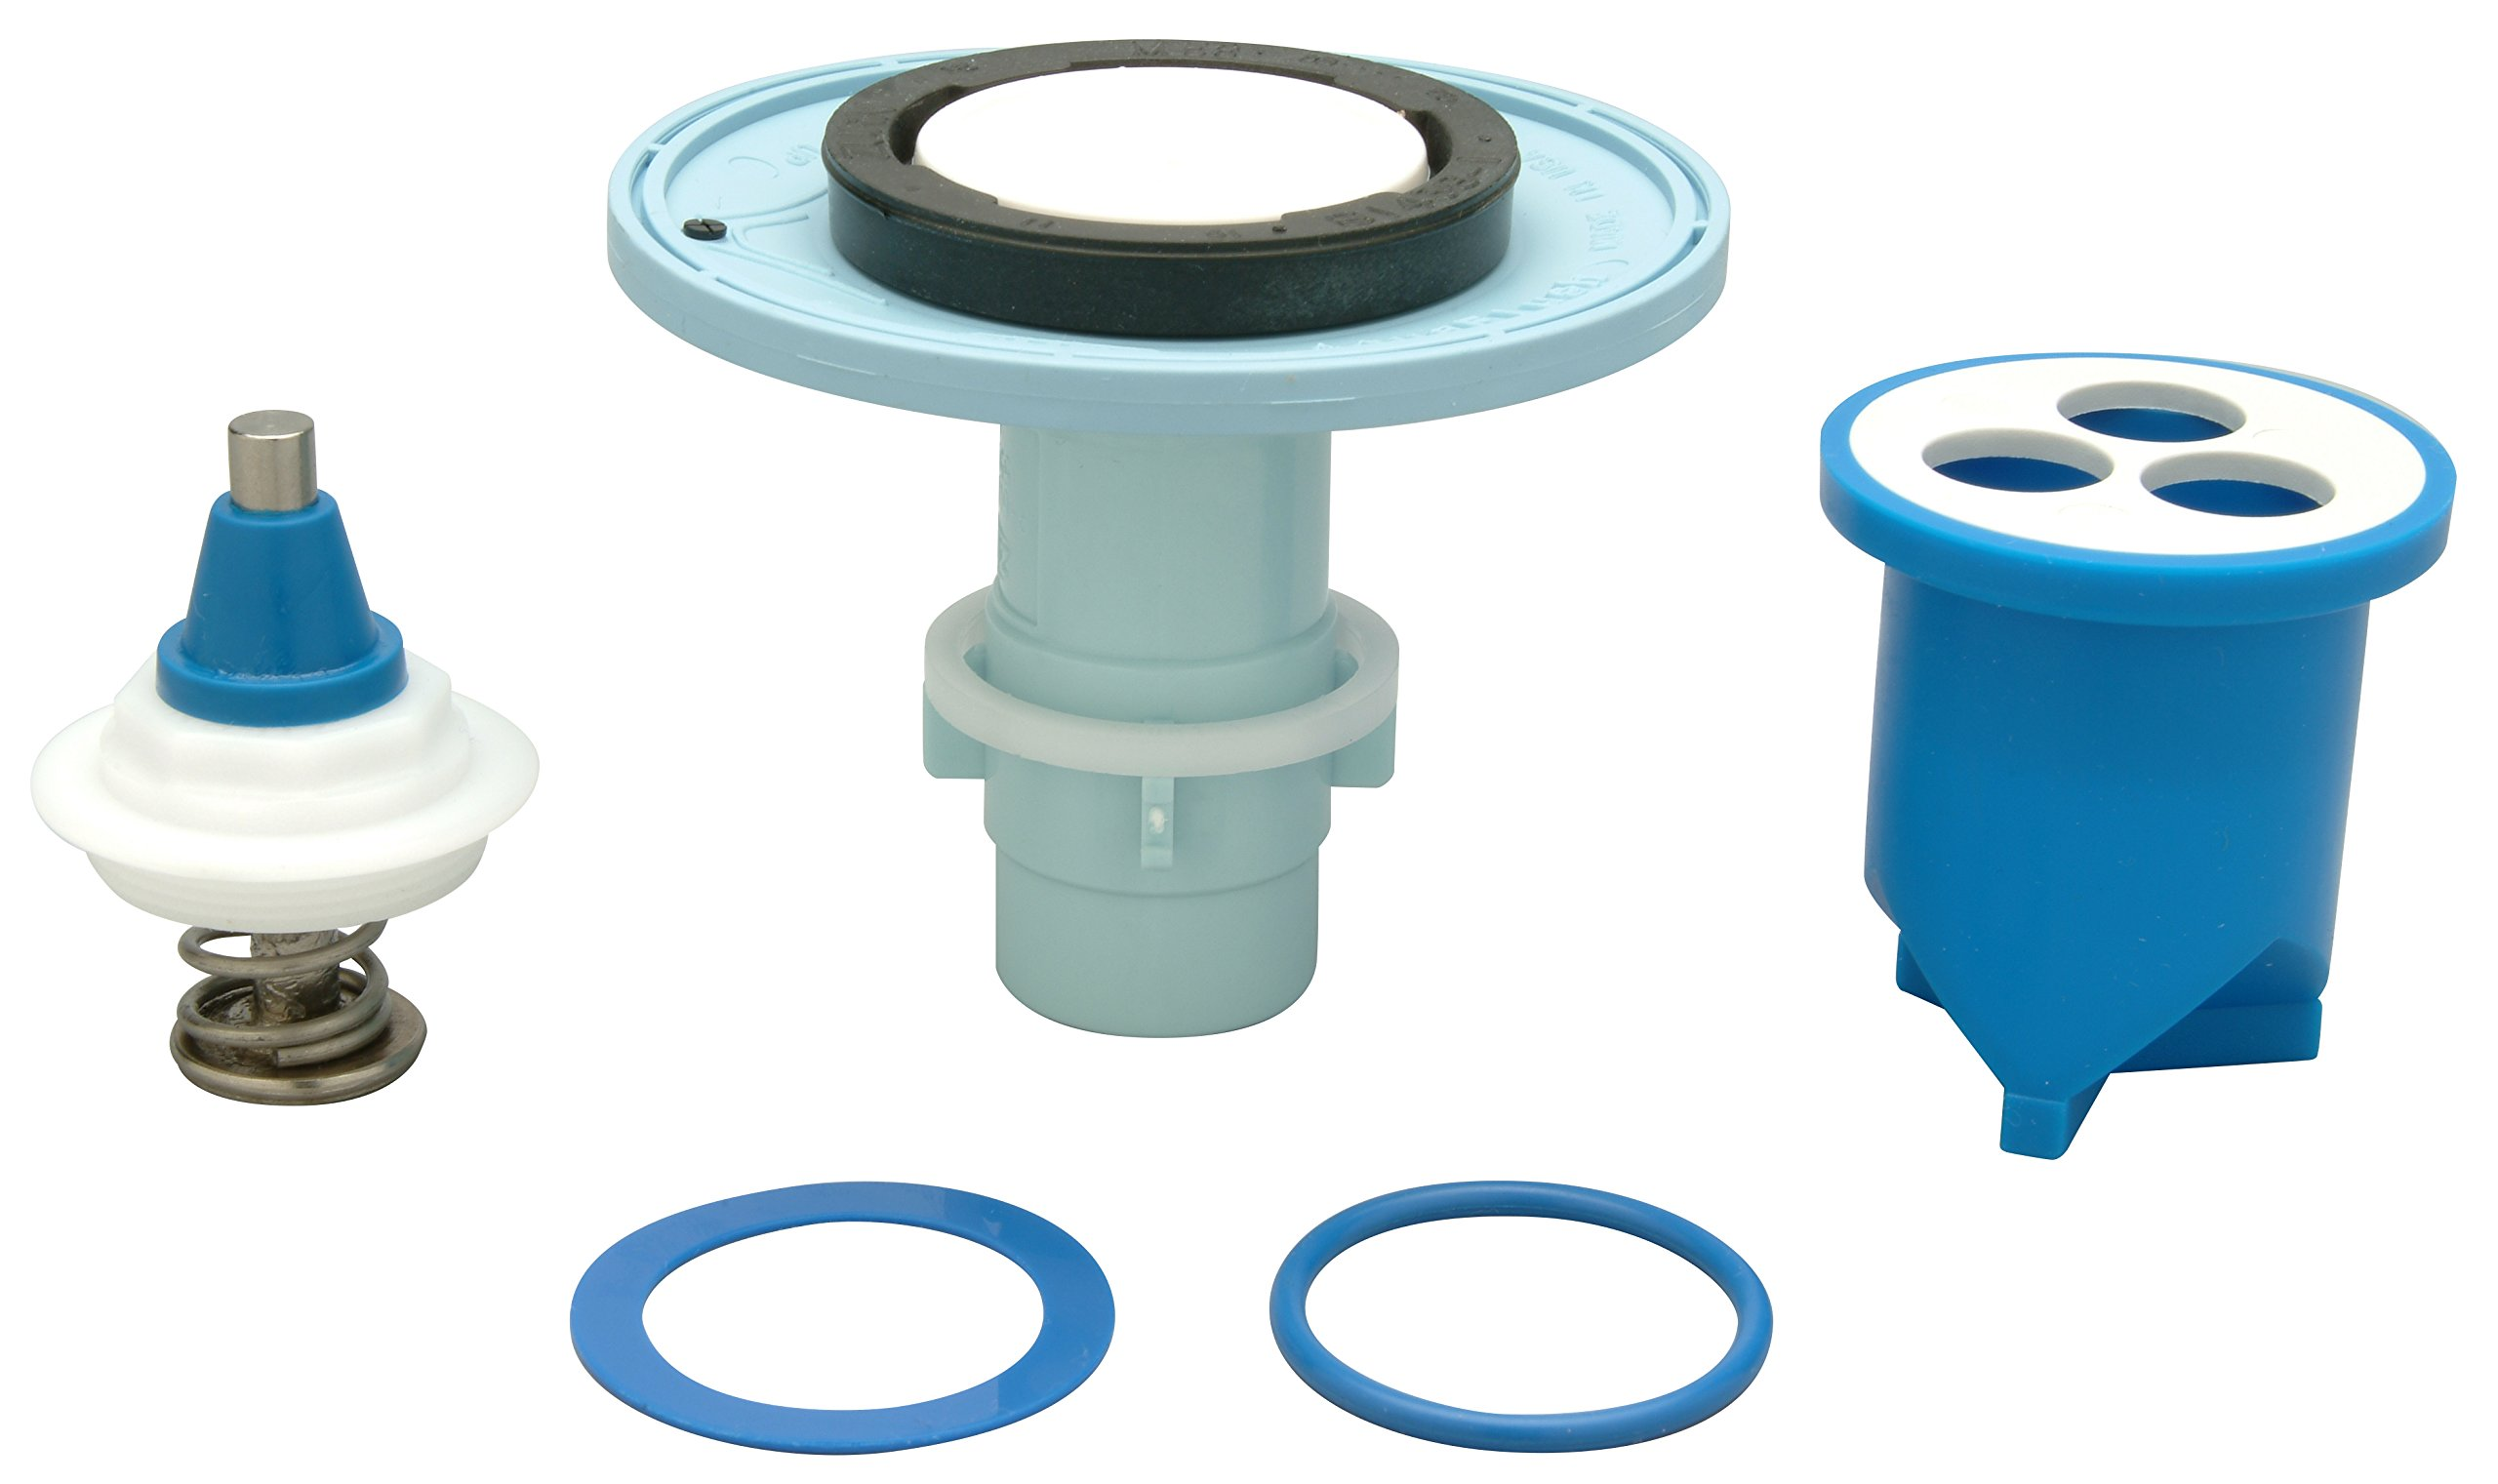 Zurn AquaFlush Closet Rebuild Kit, P6000-ECR-WS1-RK, 1.6 gpf, Diaphragm Rebuild Kit